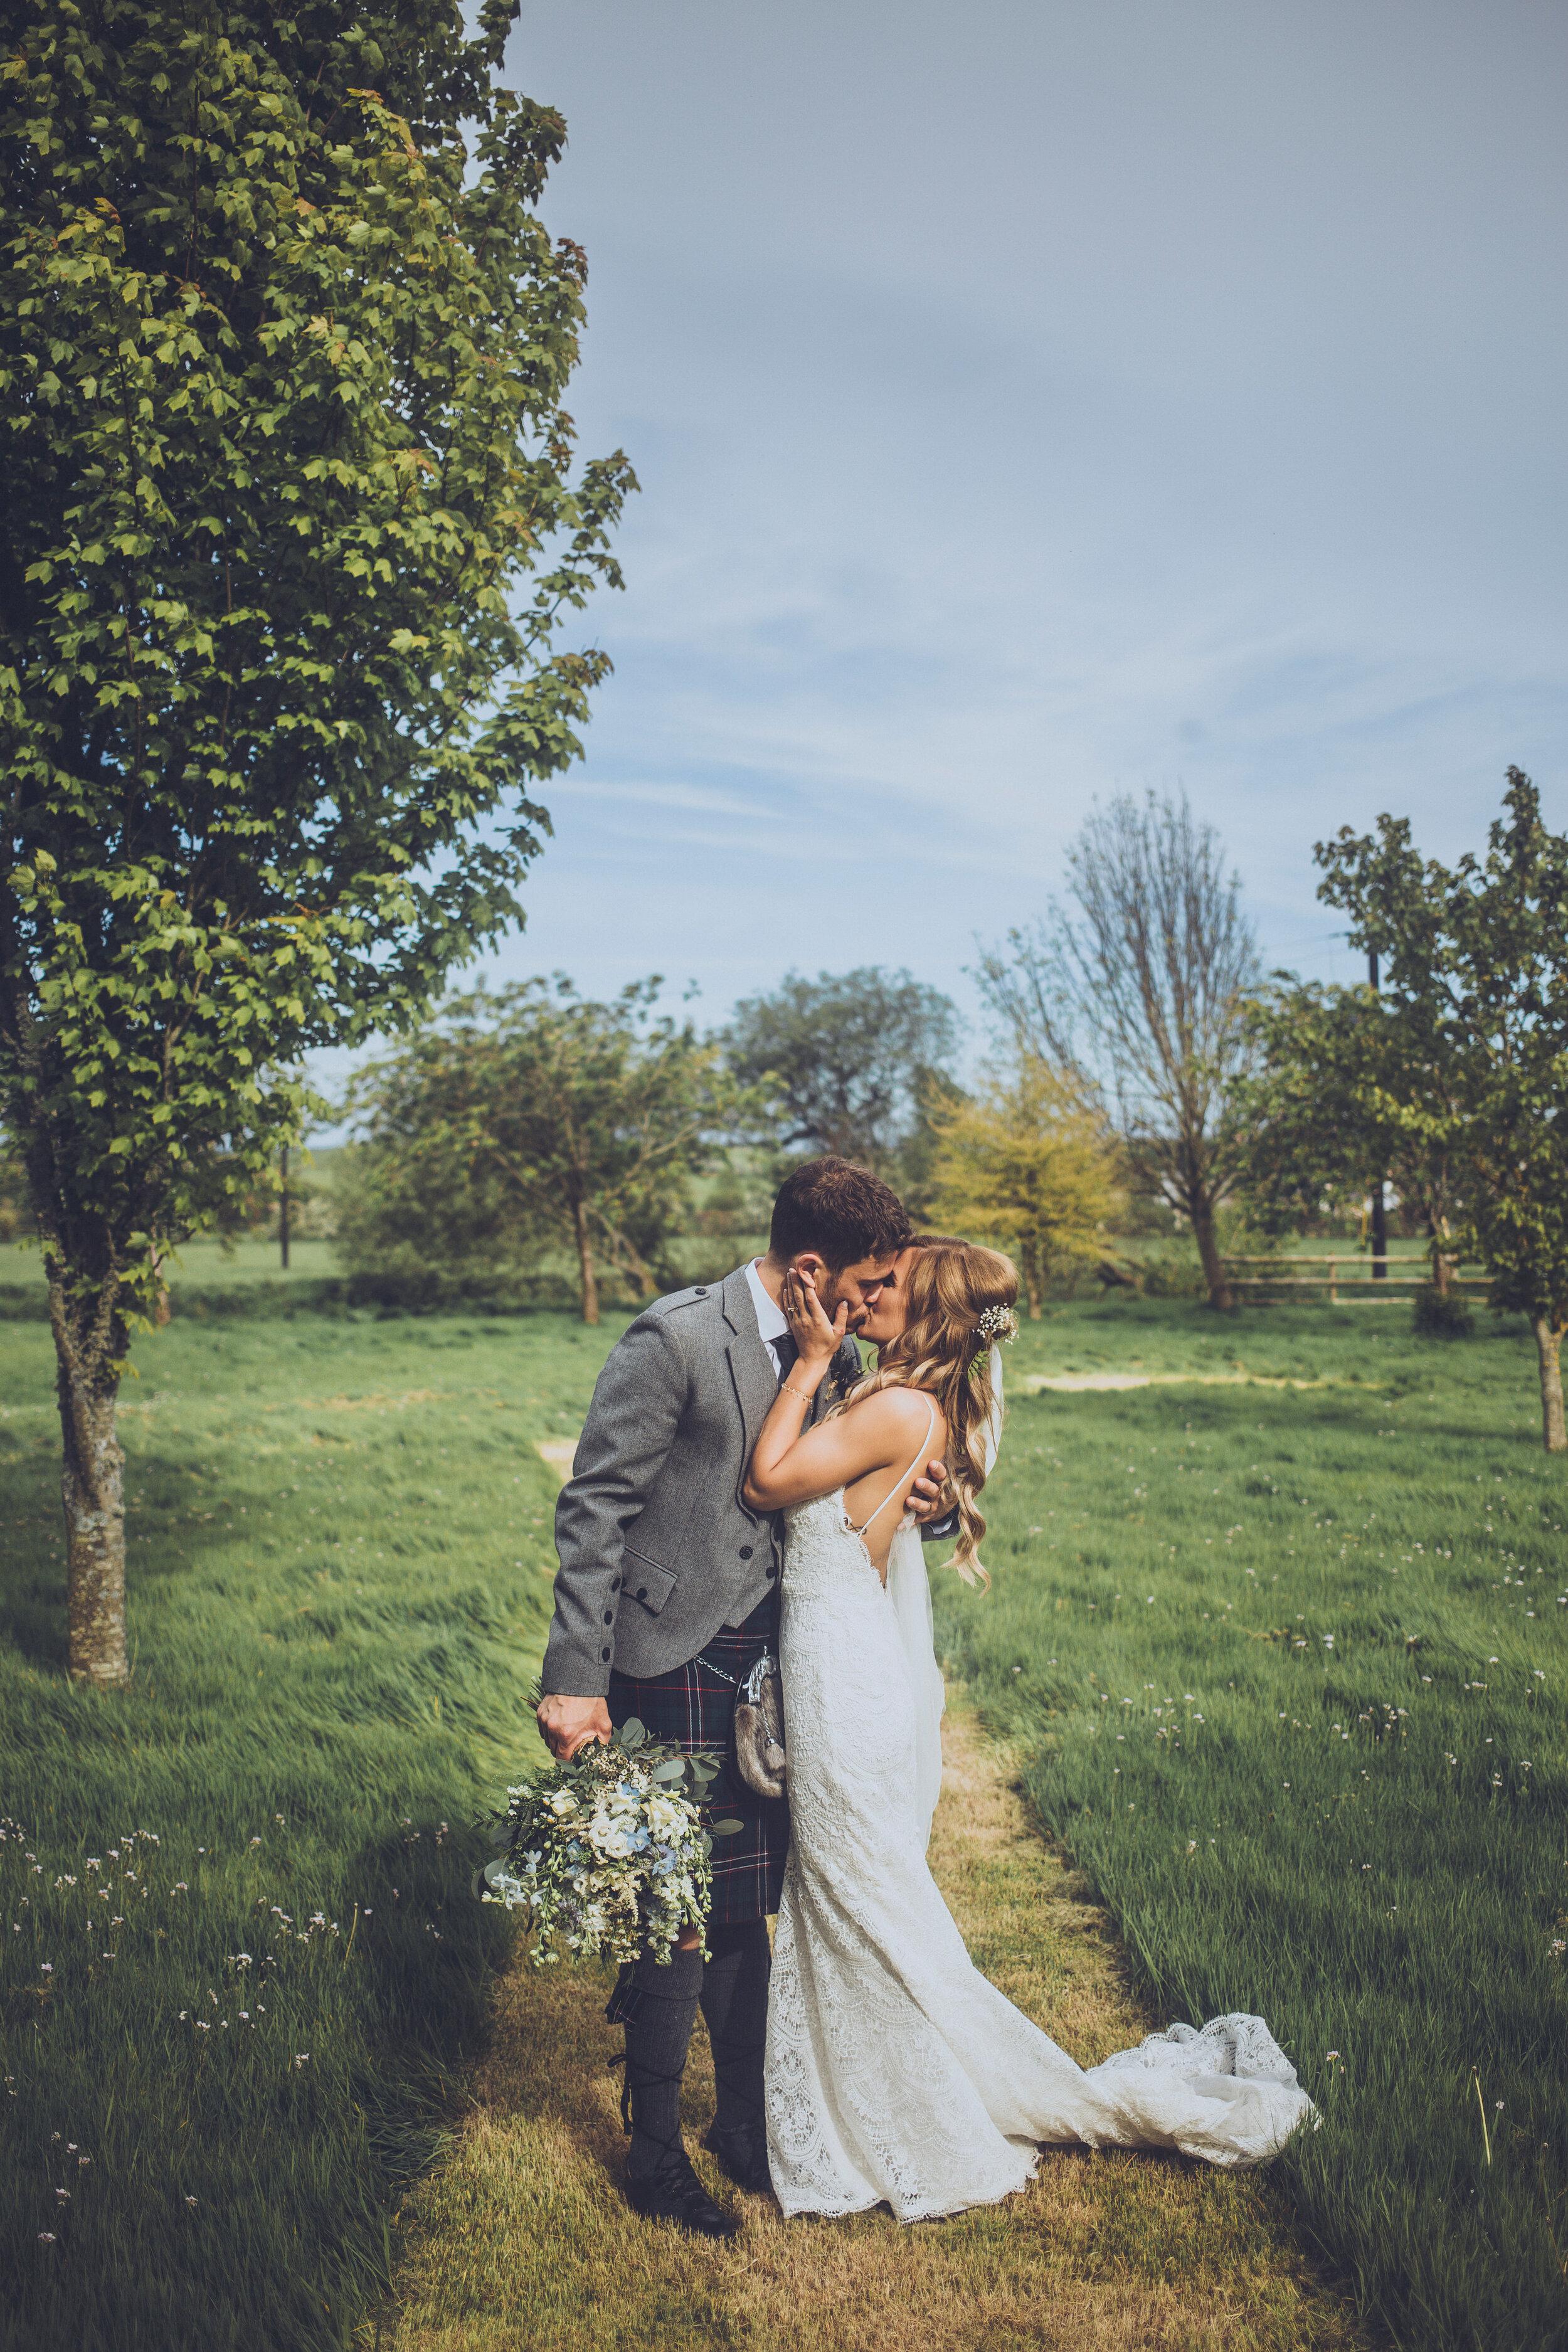 Dalduff Farm Ayrshire Wedding Photography - Claire Basiuk Photographer - 20.jpg